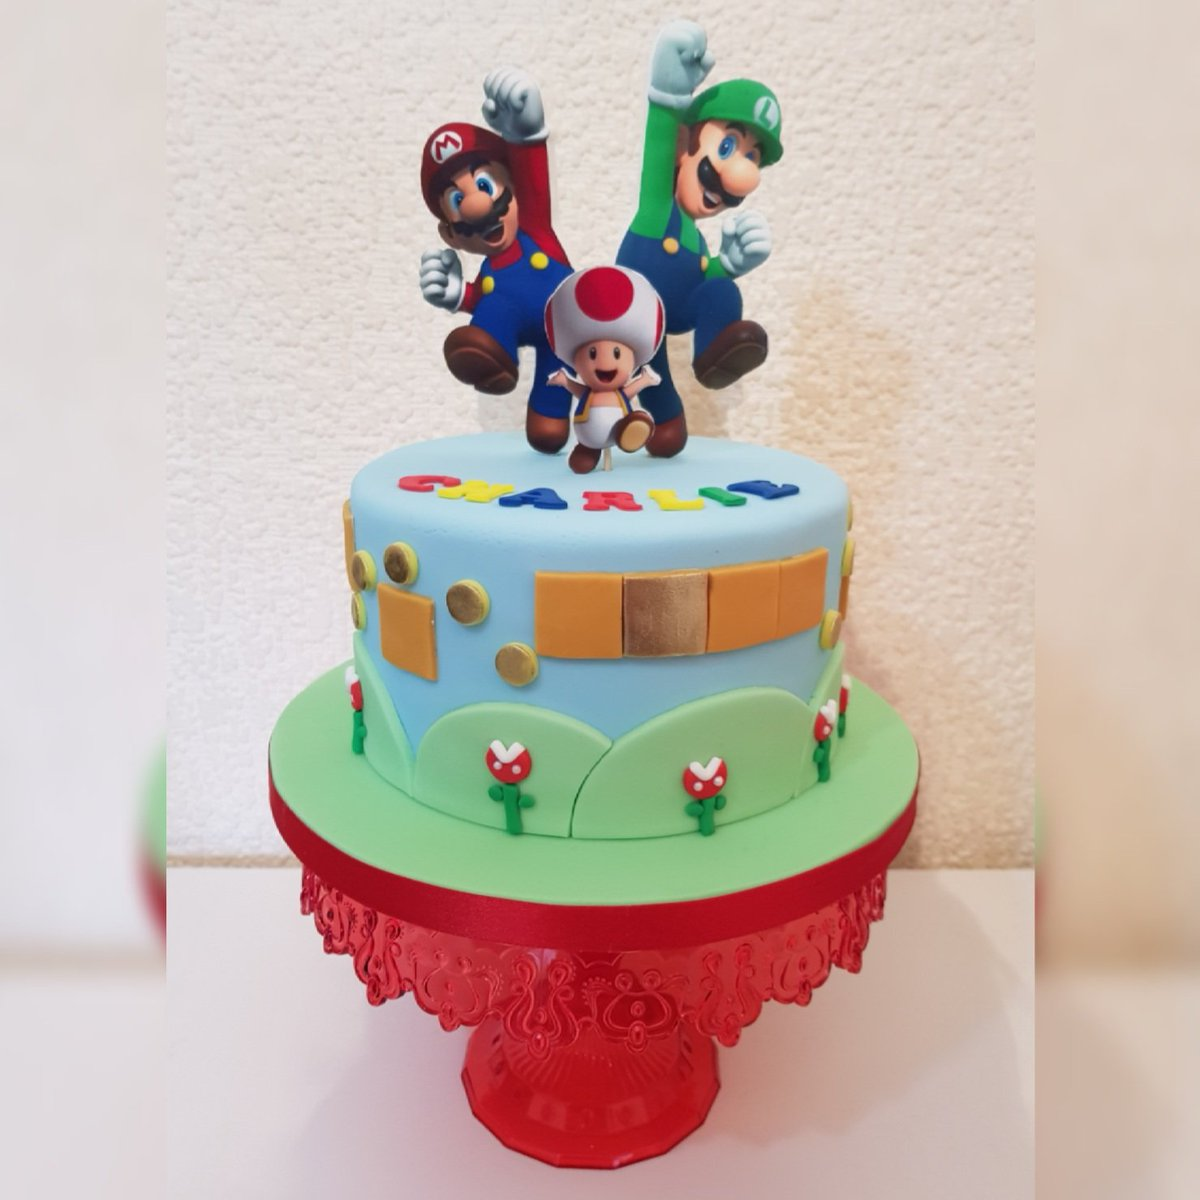 Super Auntie Cake On Twitter Mario Cake For My Nephews 5Th Birthday Personalised Birthday Cards Veneteletsinfo